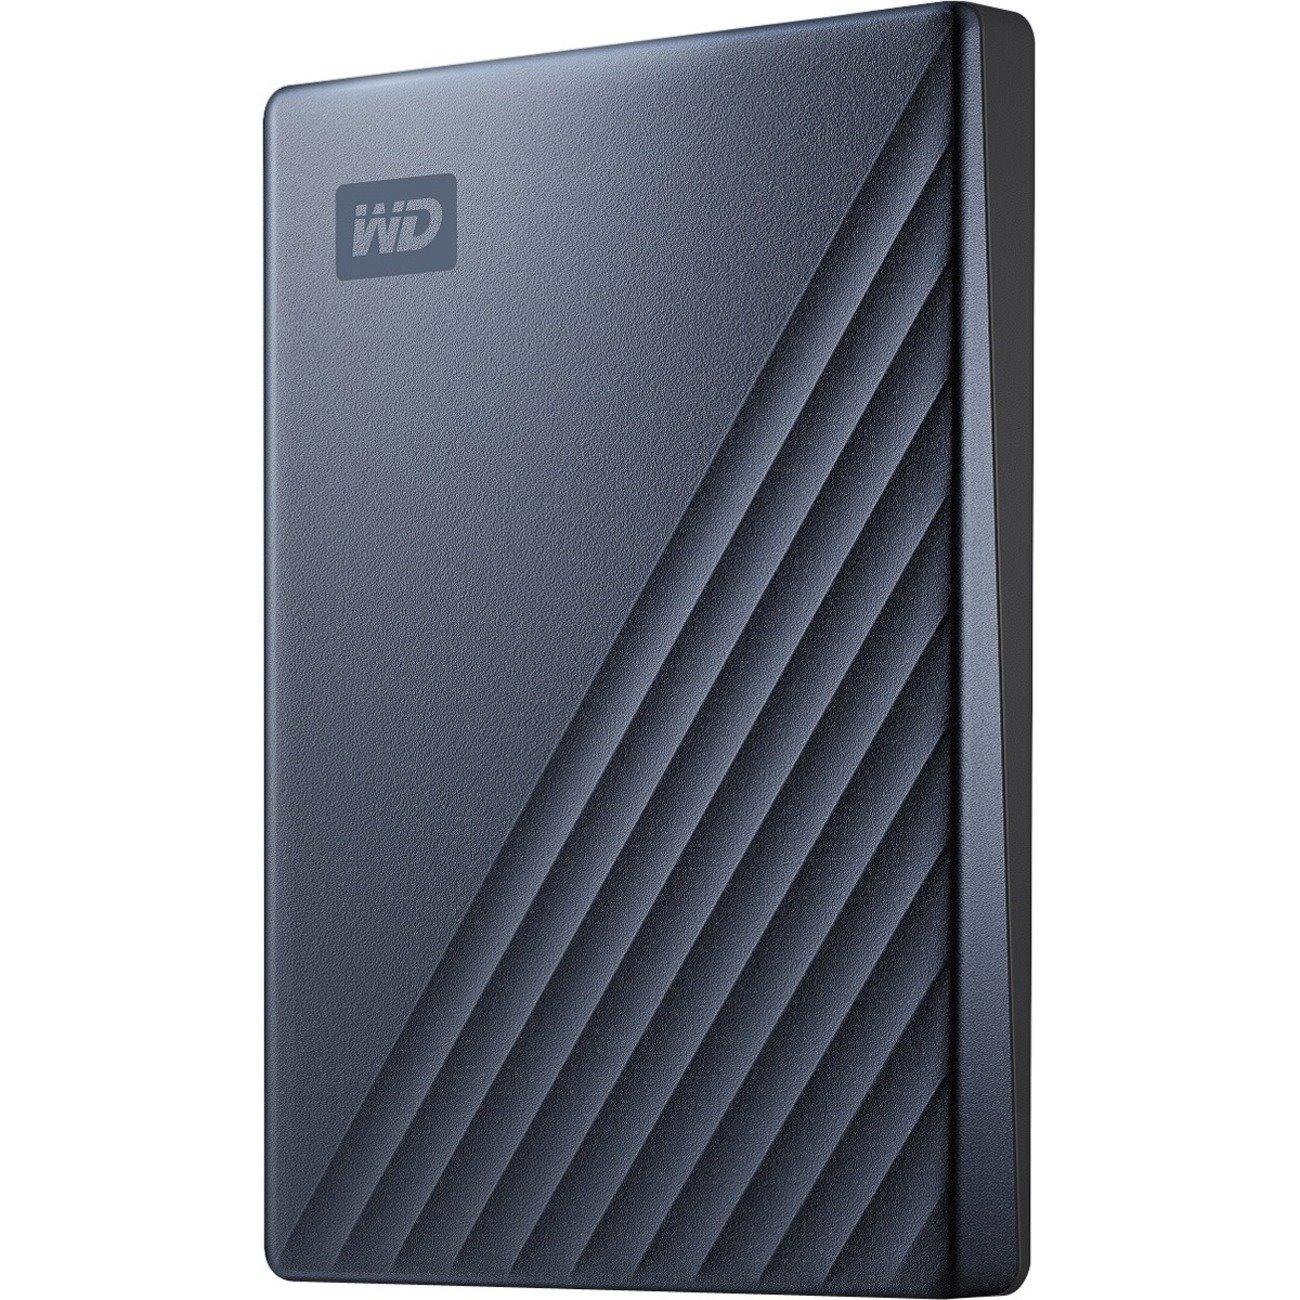 WD My Passport Ultra WDBC3C0020BBL 2 TB Portable Hard Drive - External - Blue